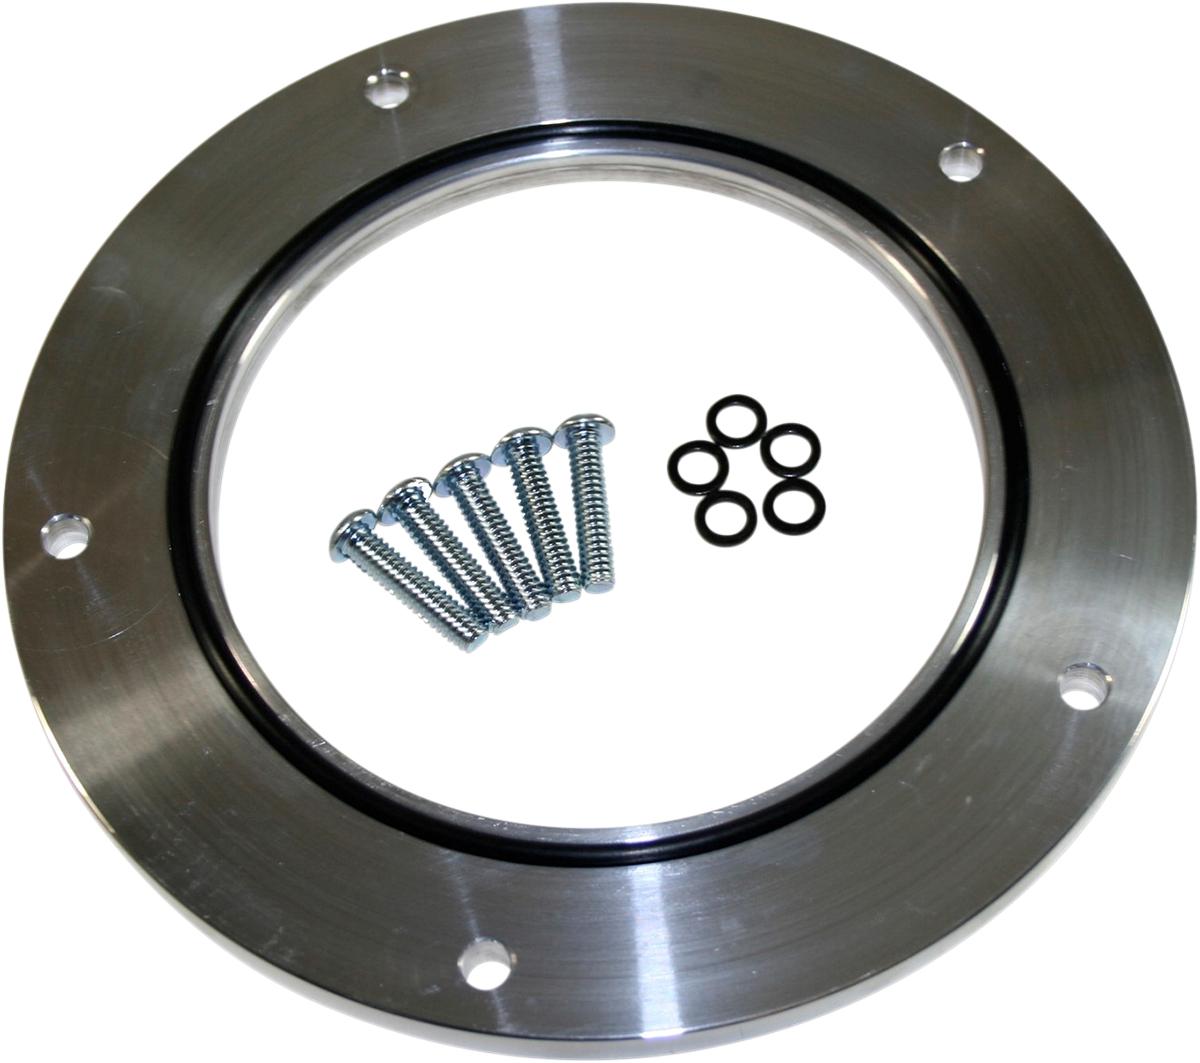 Aluminum Derby Cover Spacer Kit